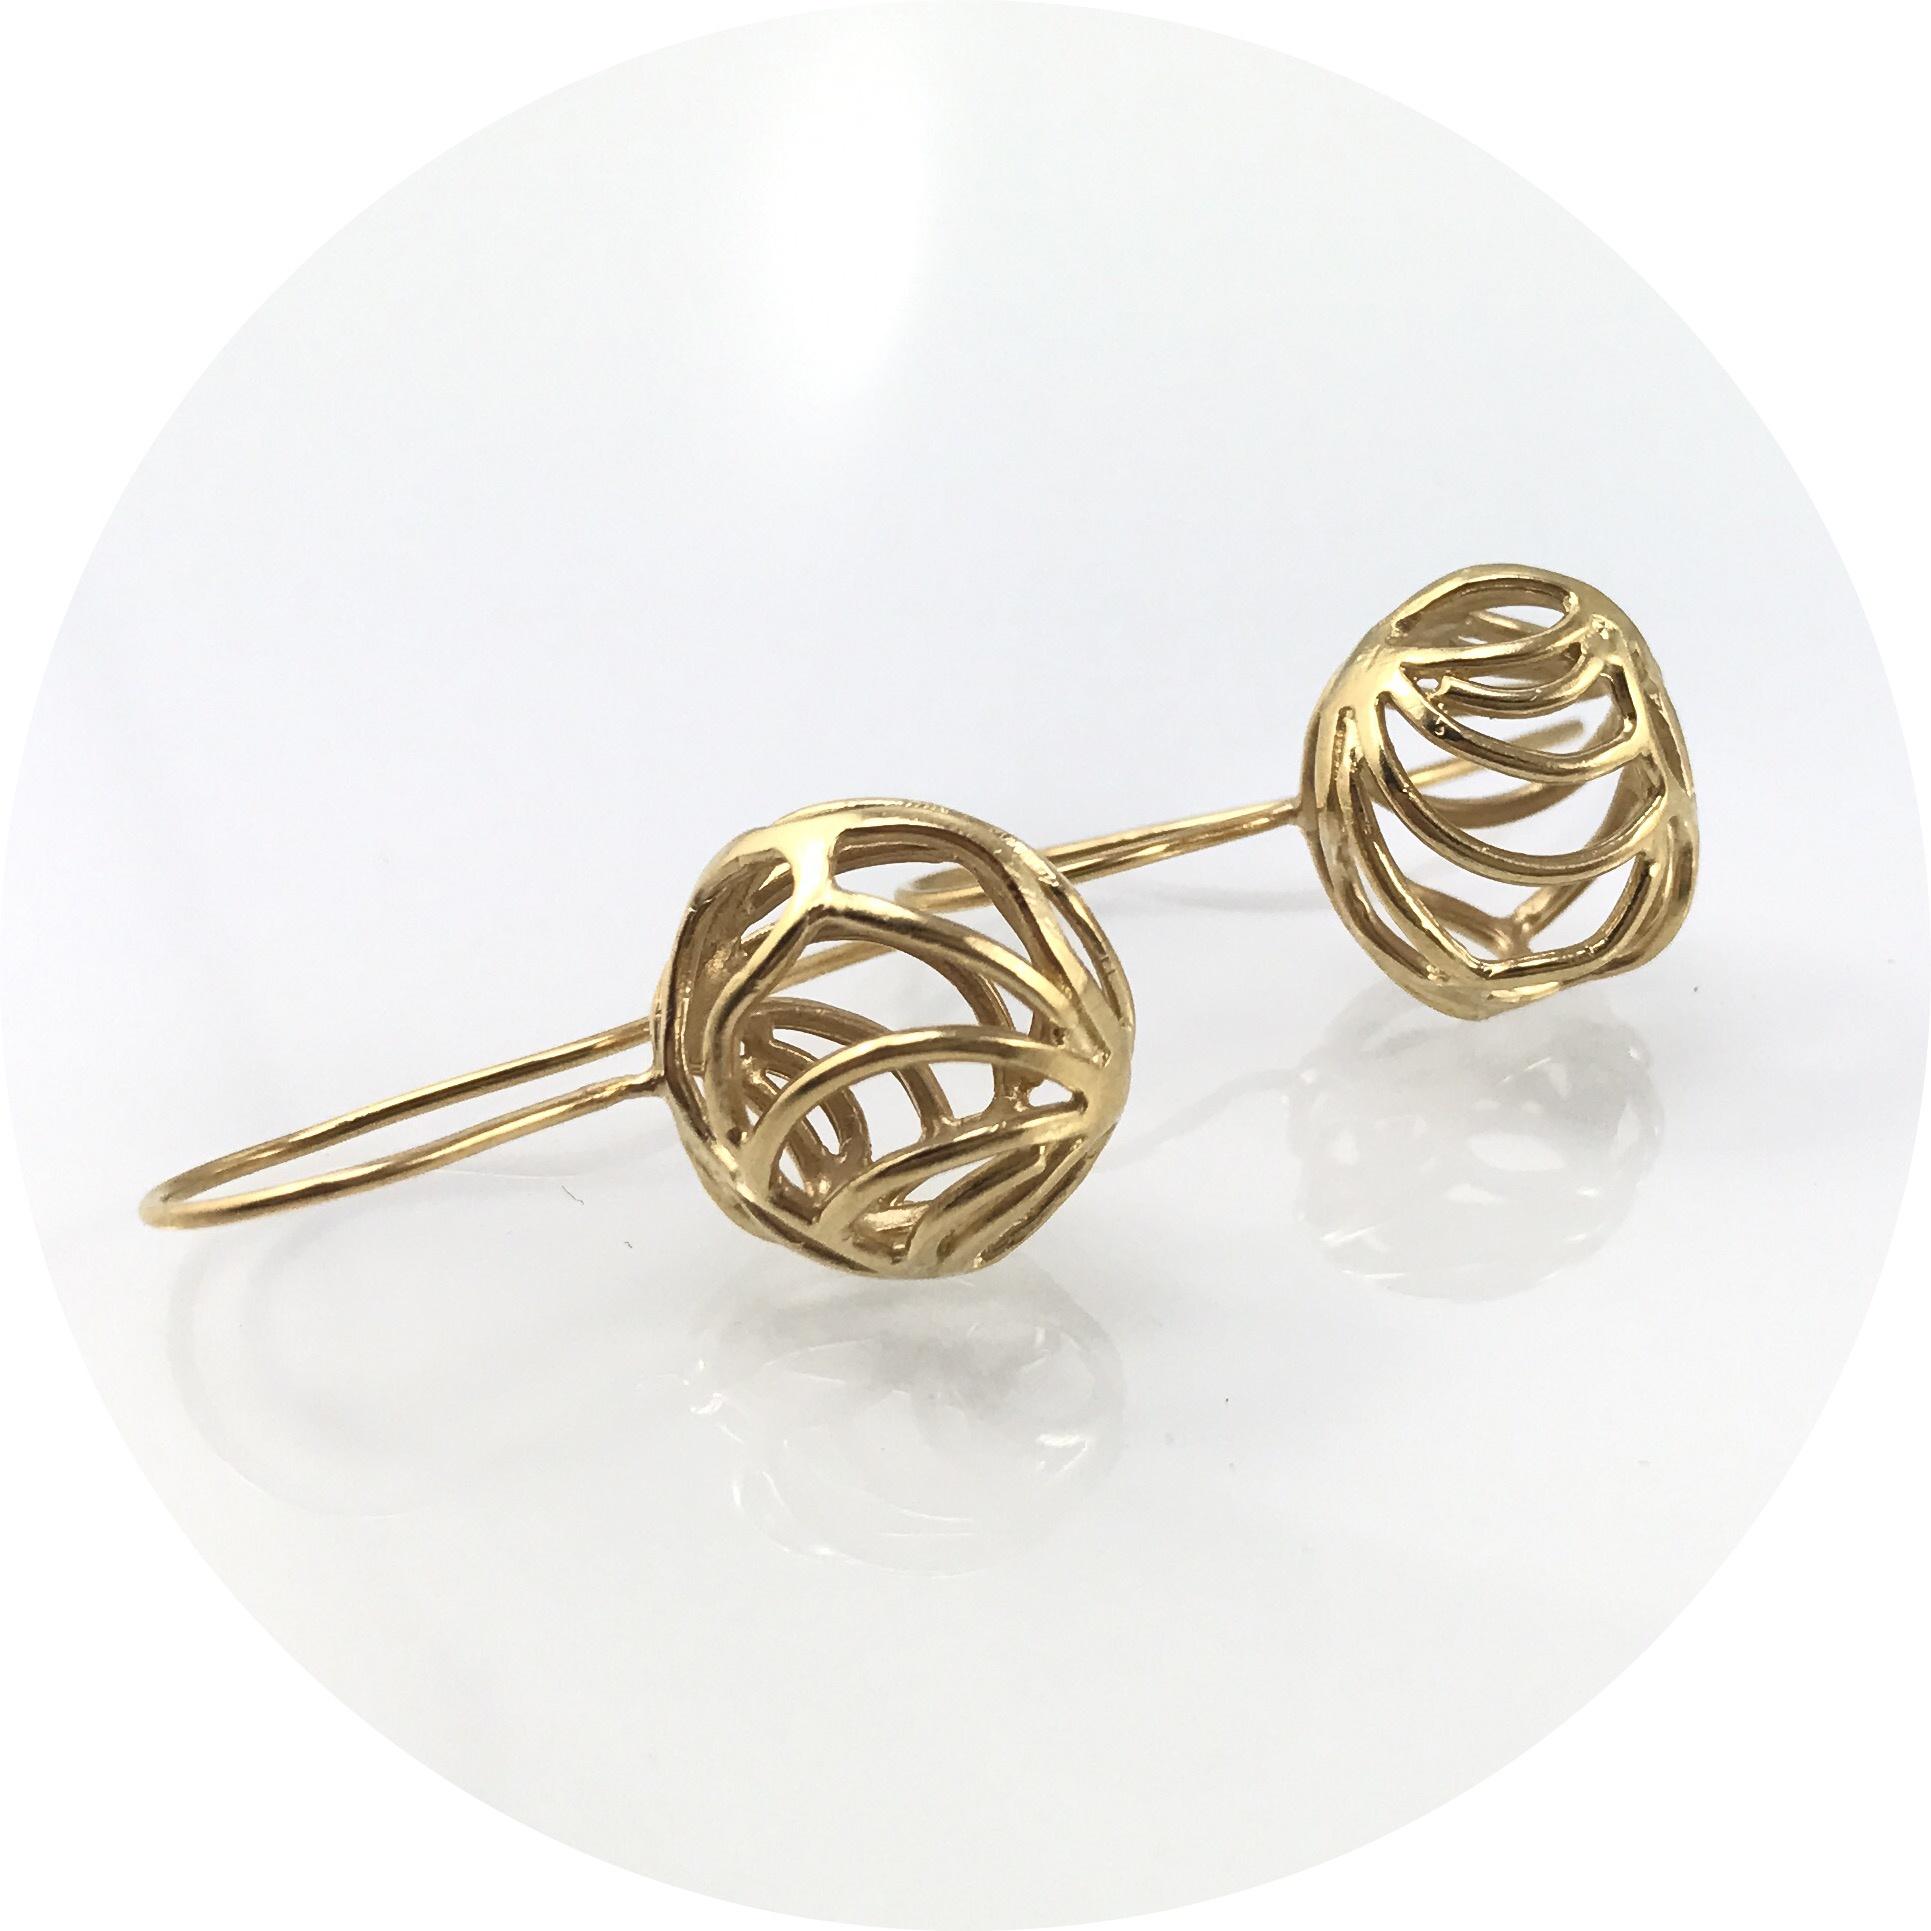 Antonia Field - Gold Plated Sterling Silver Hook Earrings